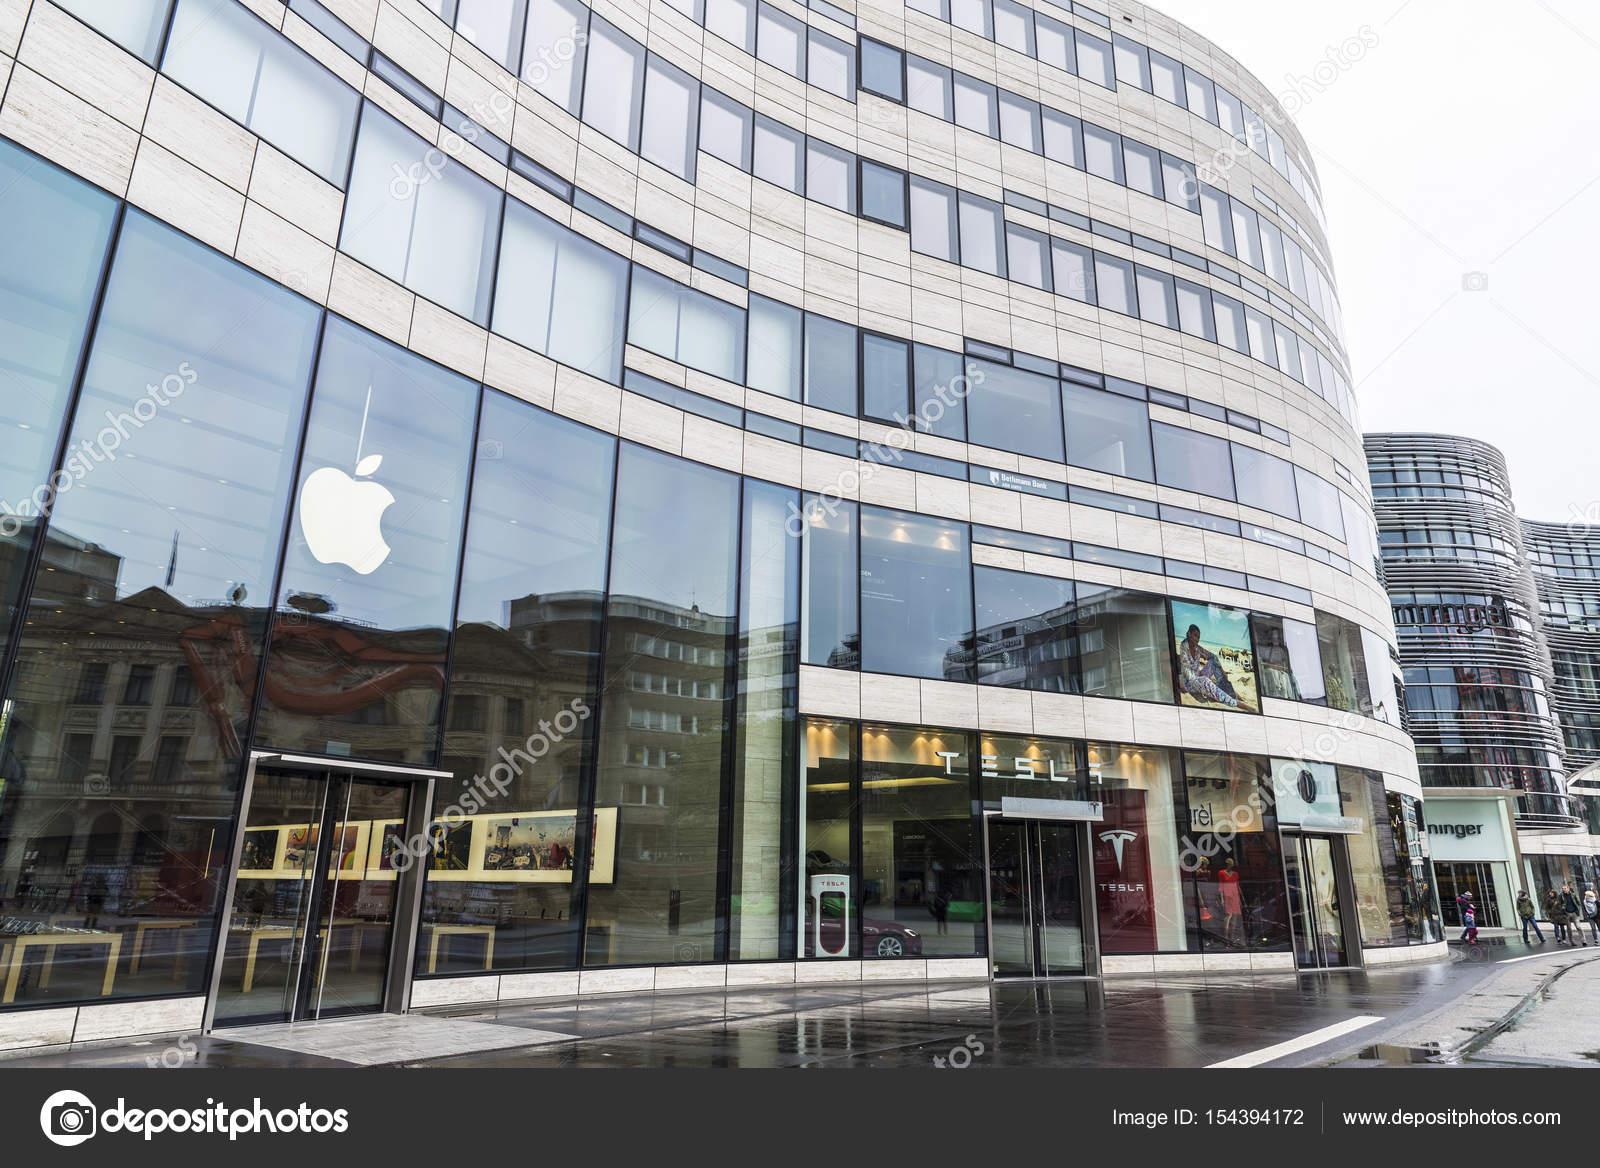 386a98c46ac Ντίσελντορφ, Γερμανία - 16 Απριλίου 2017: Μήλο κατάστημα δίπλα σε μια  αντιπροσωπεία της Tesla Motors που βρίσκεται σε ένα μοντέρνο κτήριο στο  Ντίσελντορφ, ...